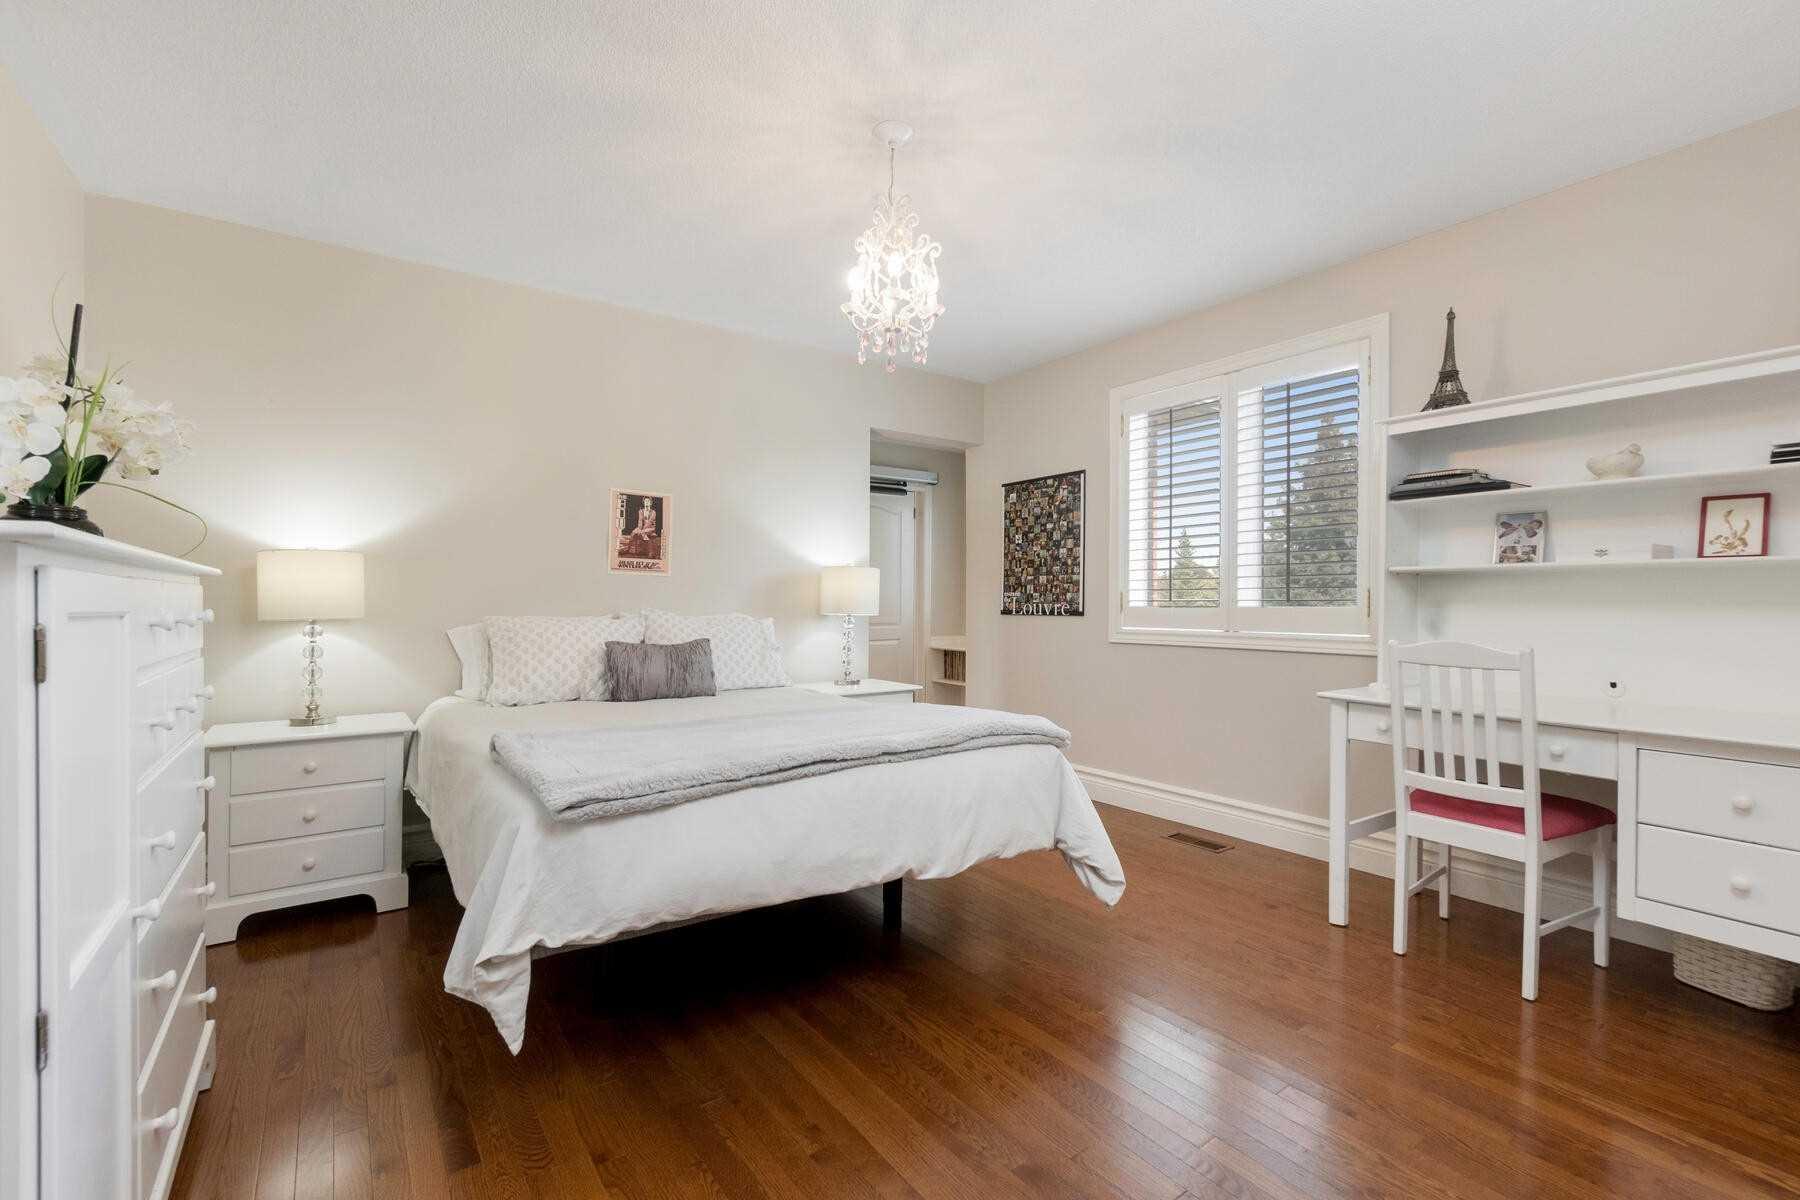 Detached house For Sale In Halton Hills - 4 Forest Ridge Cres, Halton Hills, Ontario, Canada L0P 1H0 , 4 Bedrooms Bedrooms, ,5 BathroomsBathrooms,Detached,For Sale,Forest Ridge